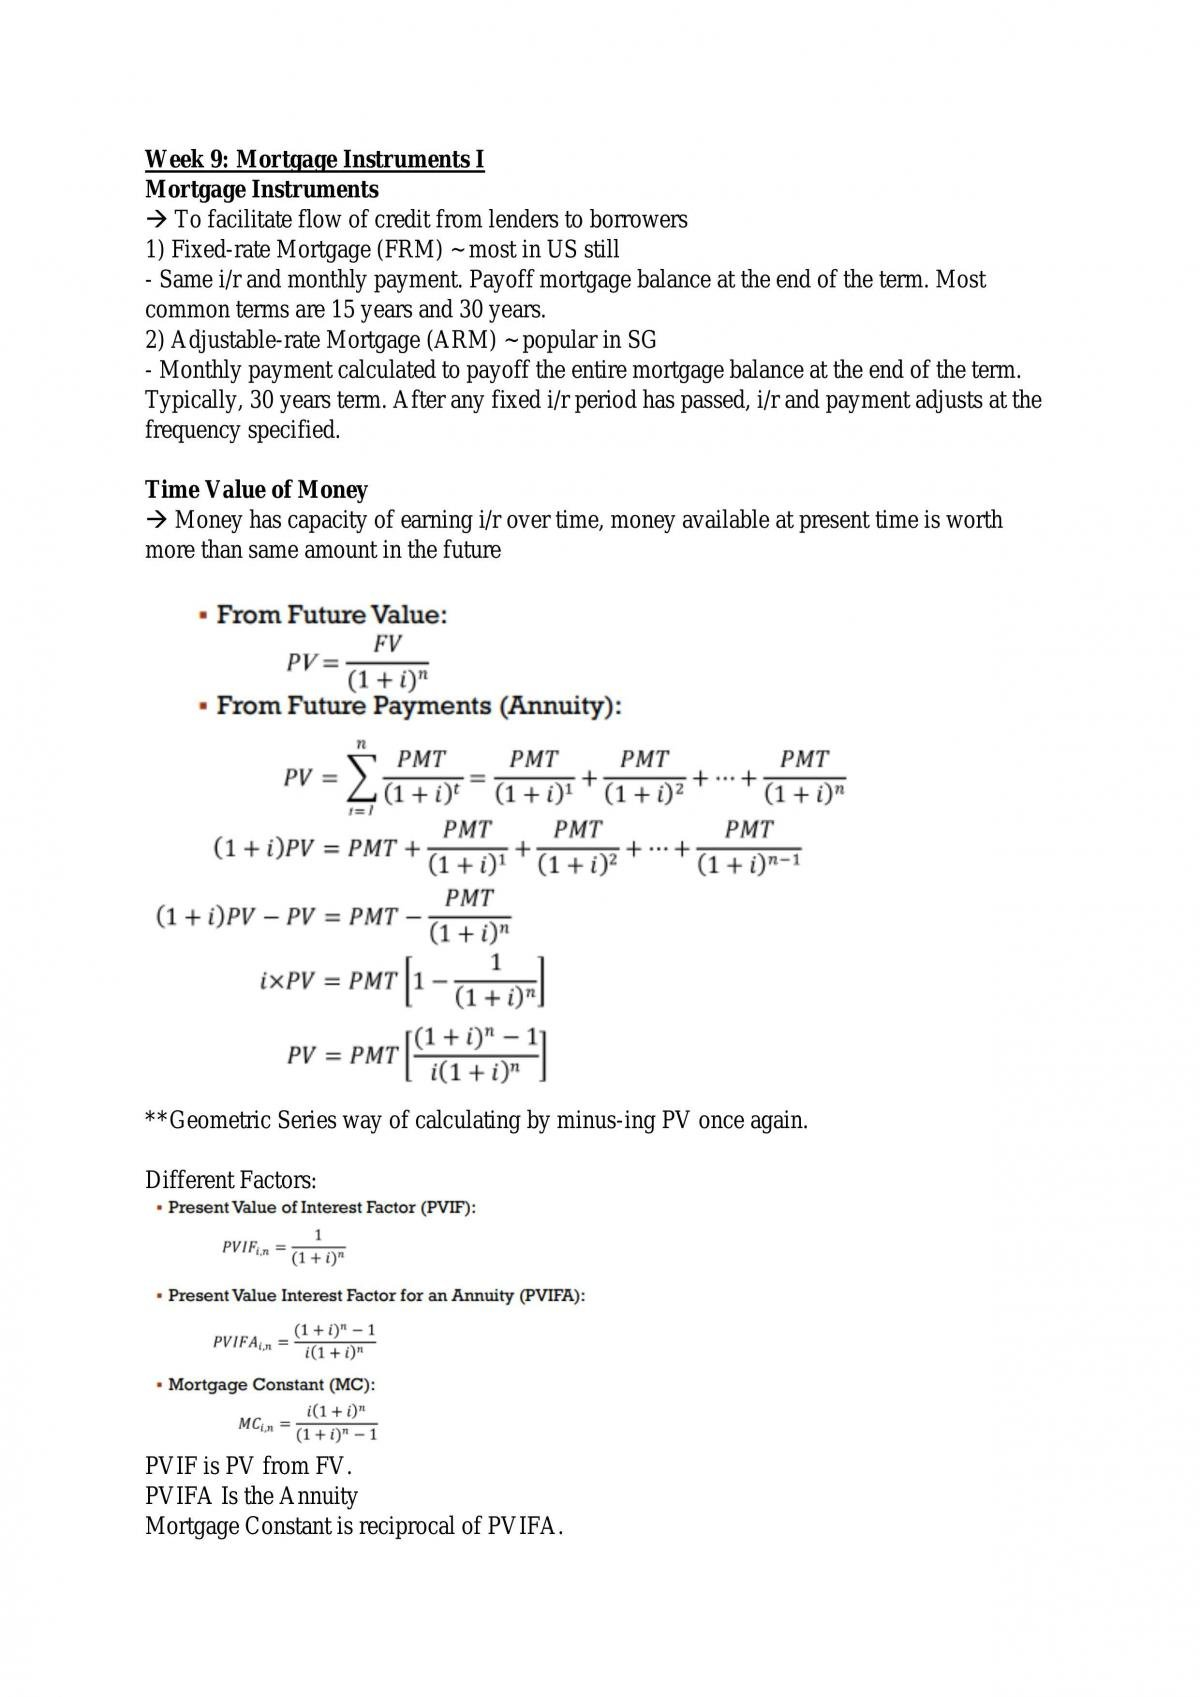 Real Estate Economics Notes - Page 48